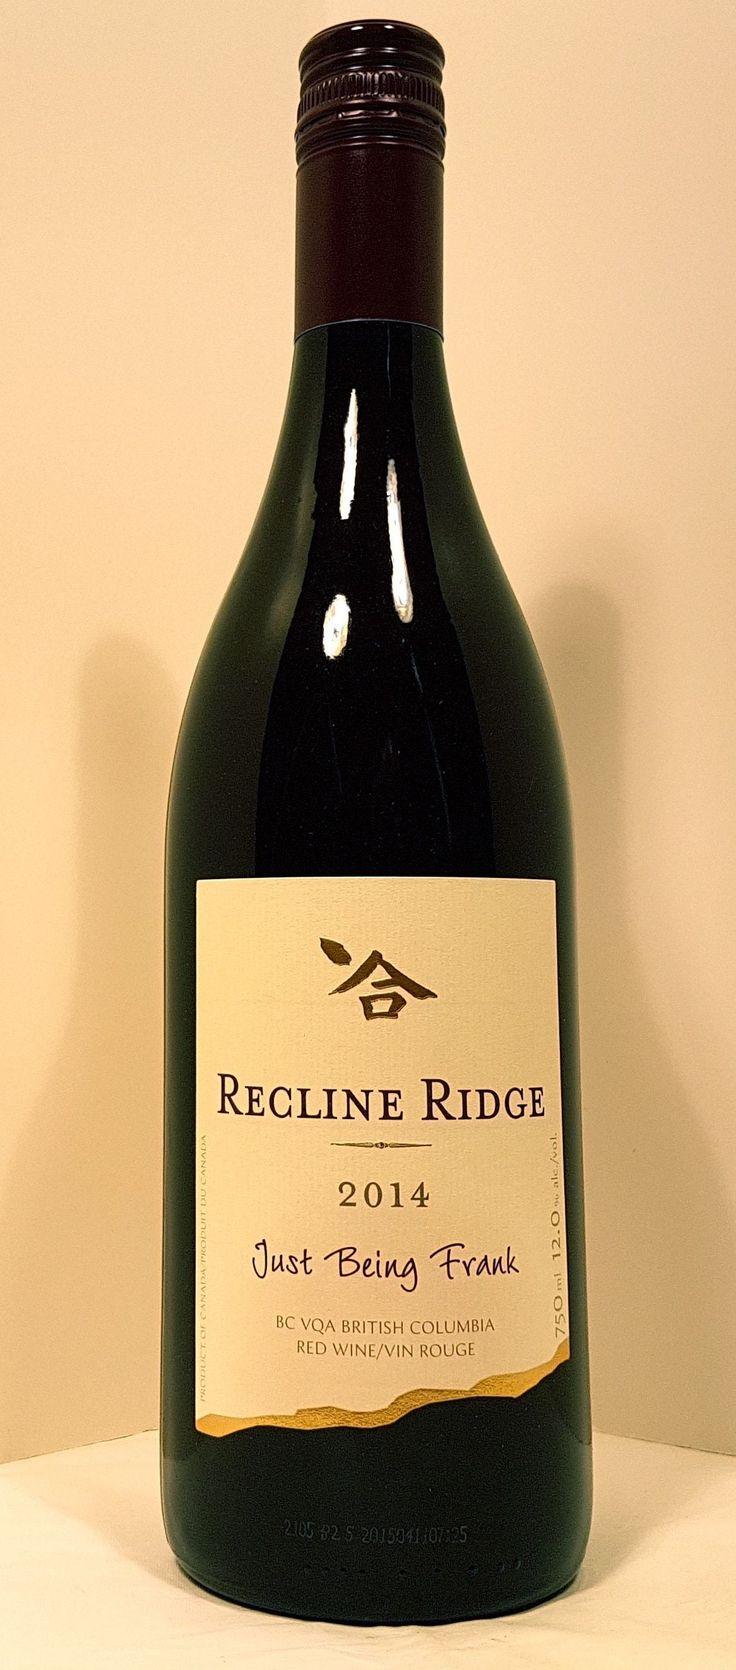 Recline Ridge